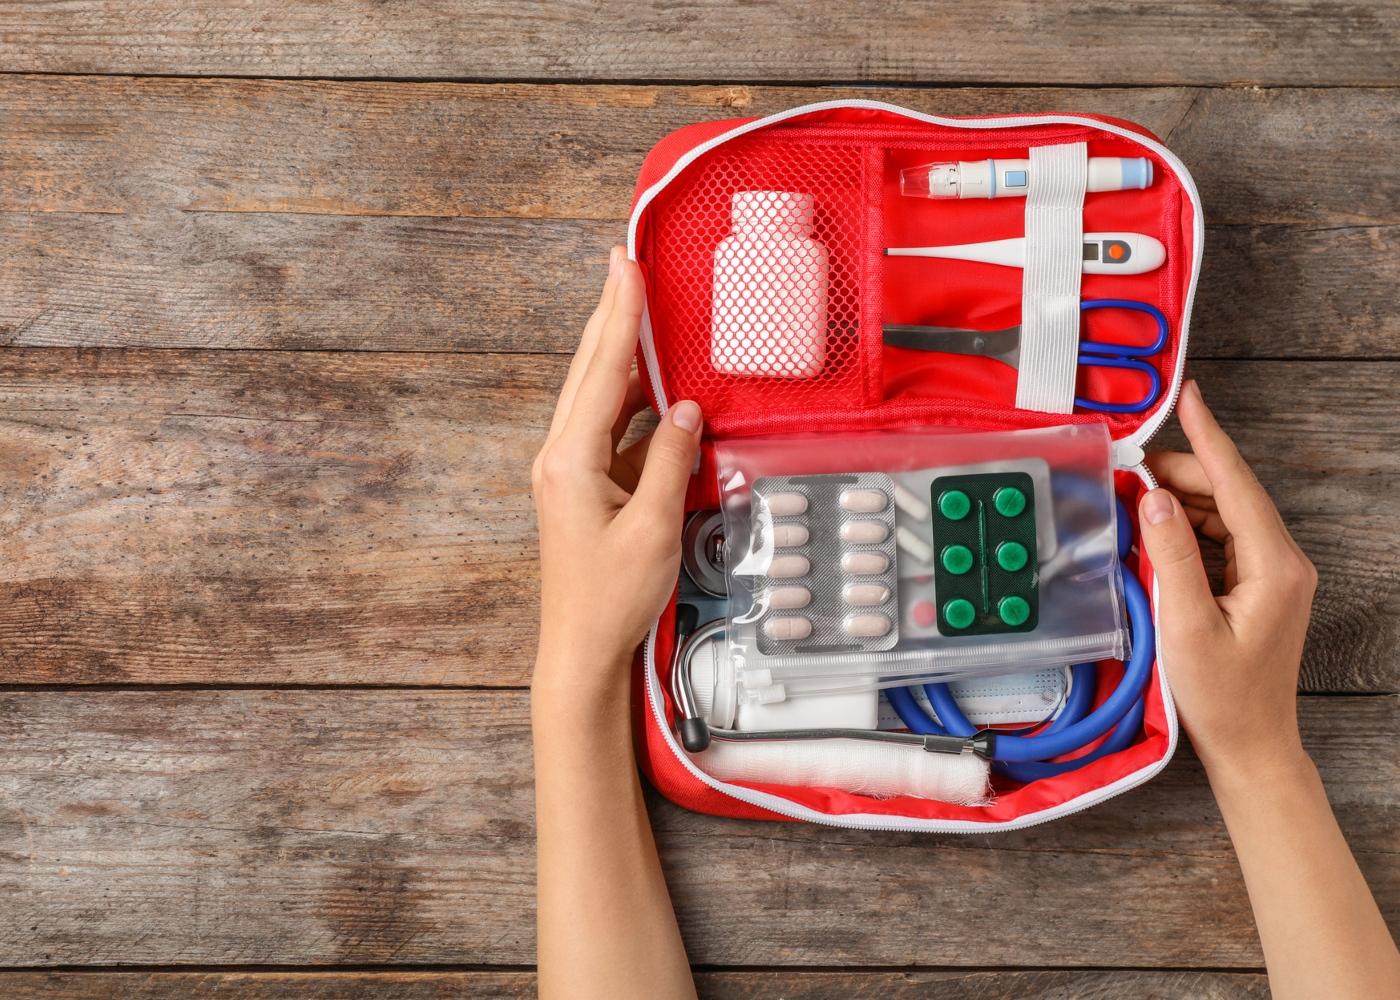 Regras básicas de primeiros socorros: kit